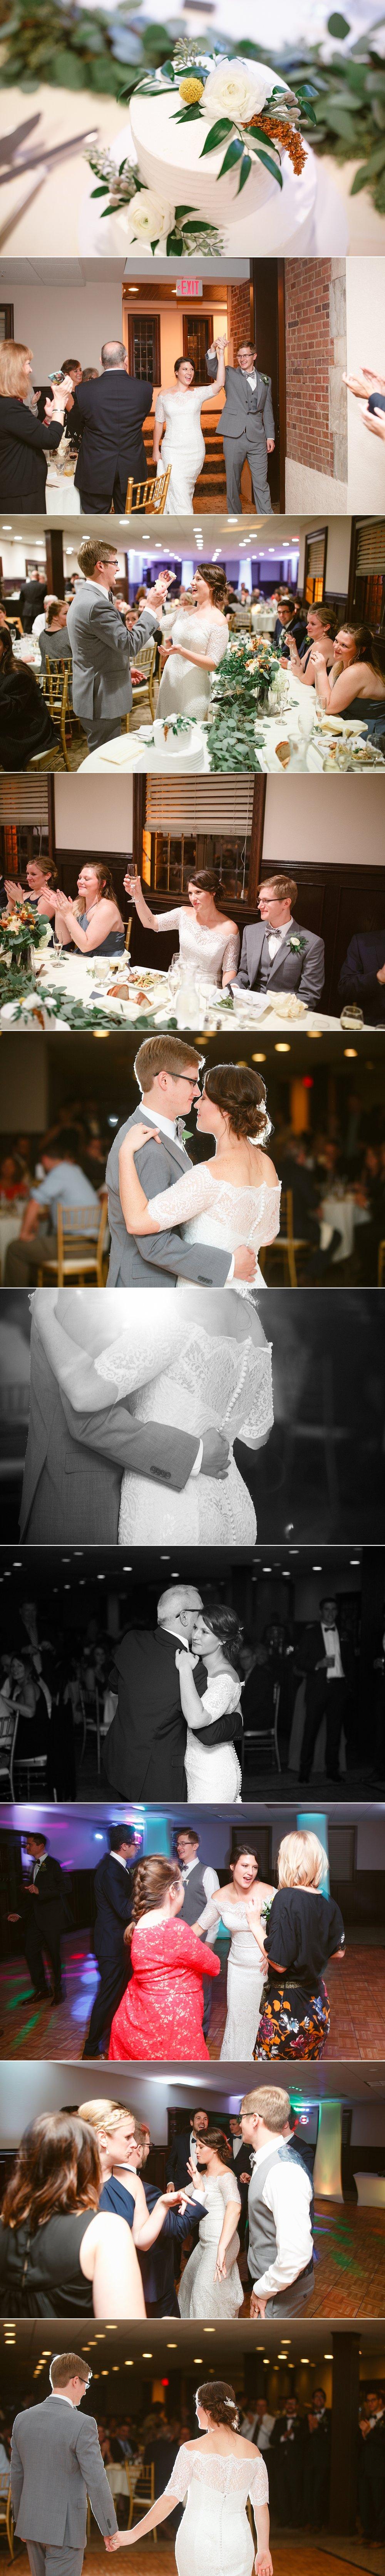 Midwest fine art wedding Des Moines Fall Wedding photographer_0301.jpg